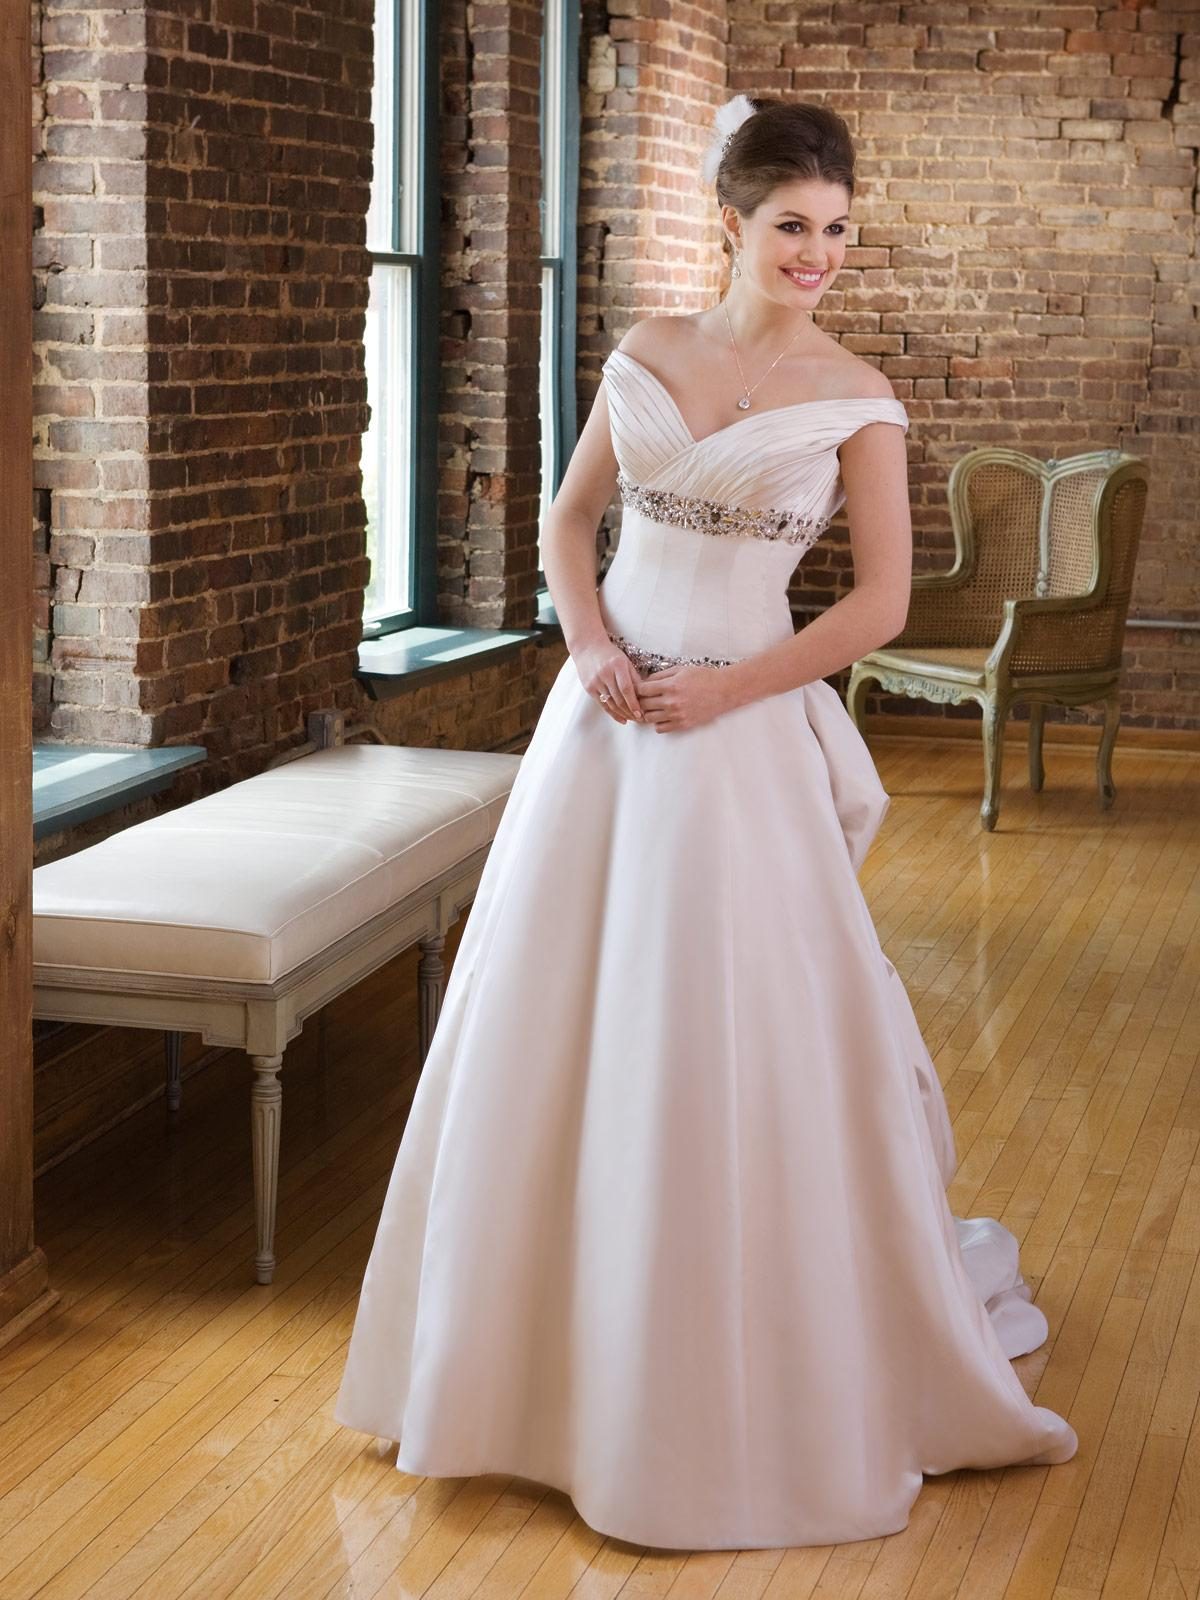 Diamond White wedding dress